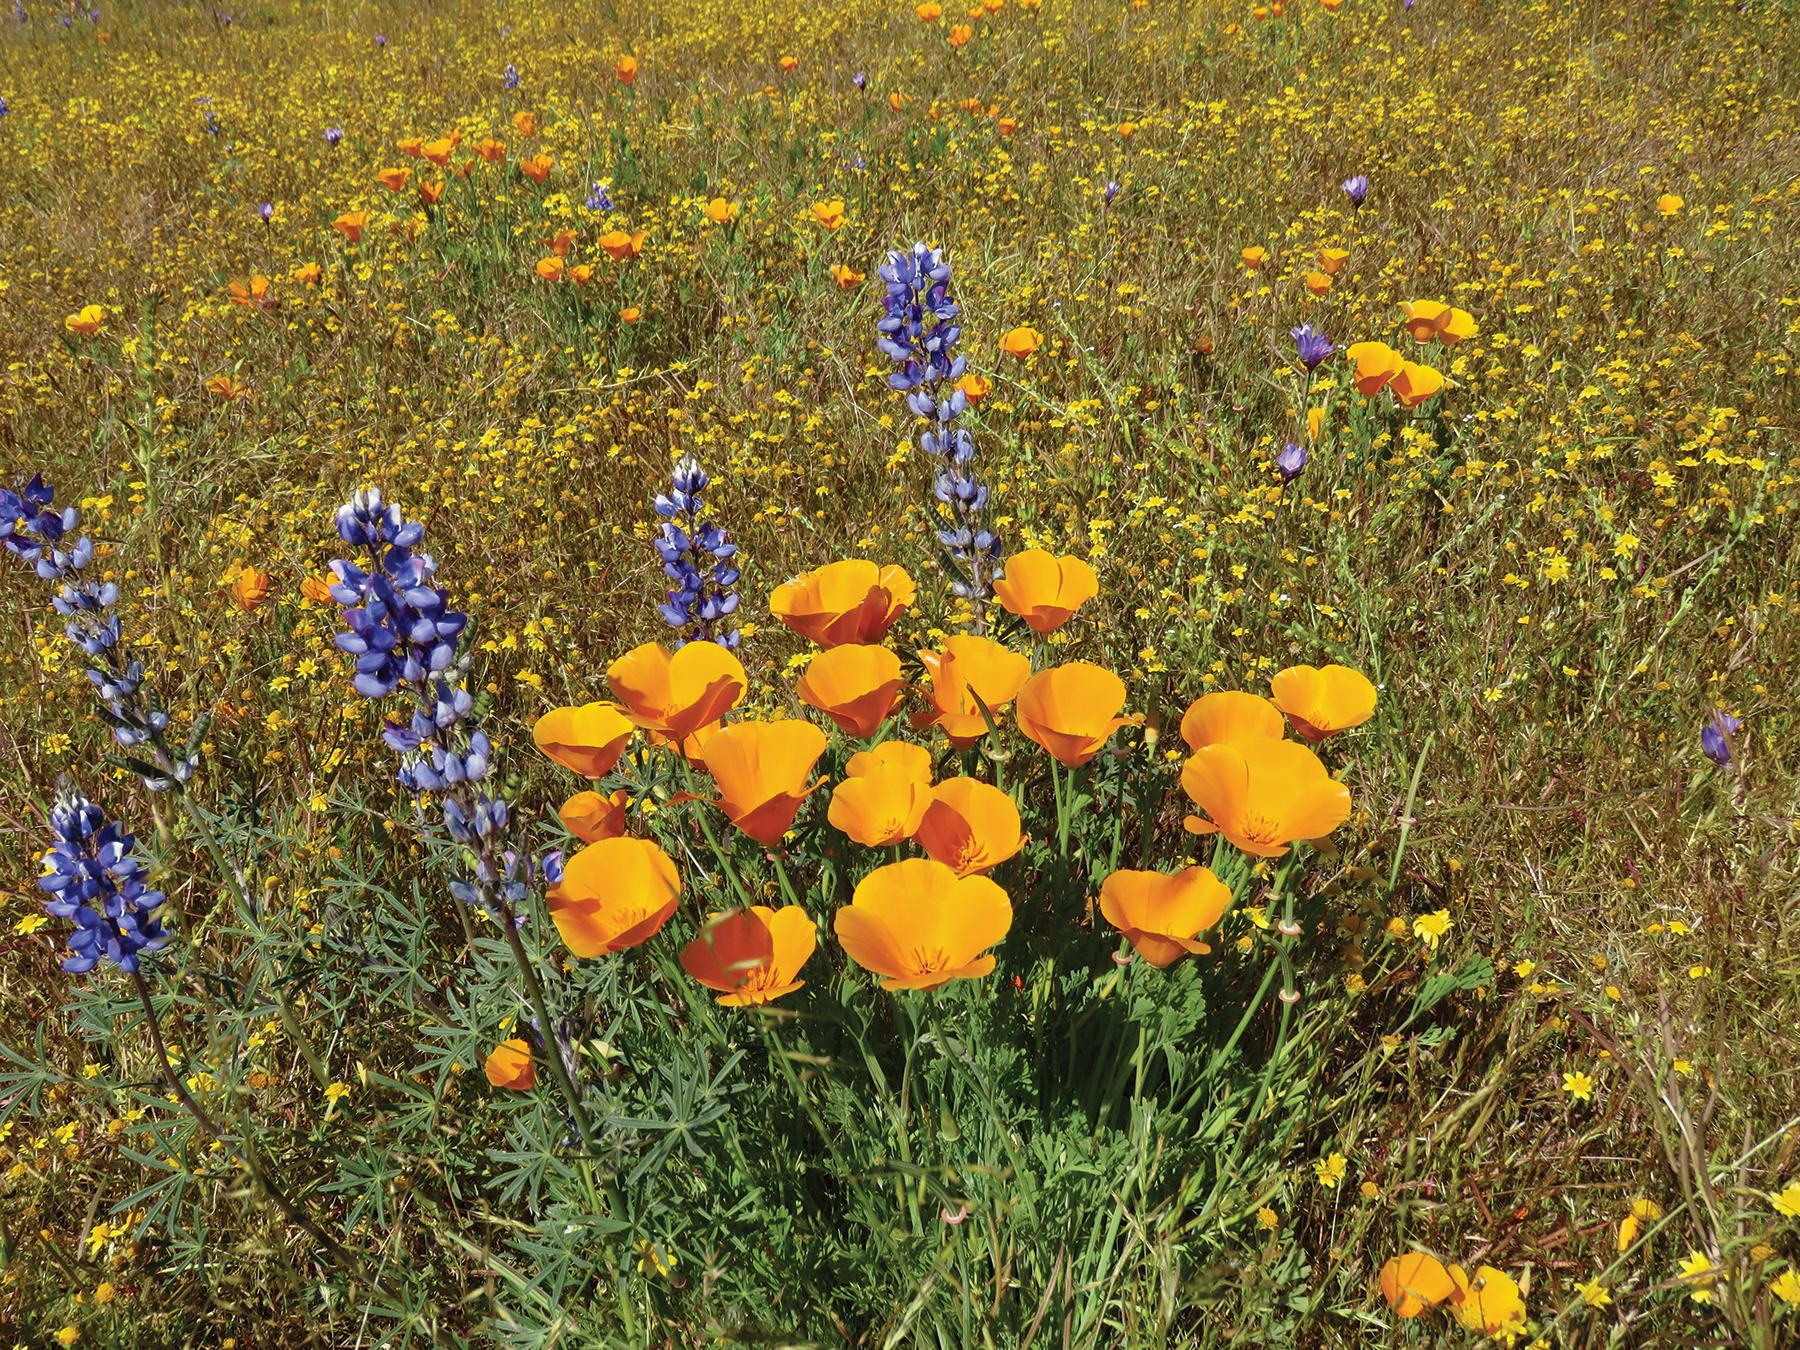 California poppies, arroyo lupine in Carrizo Plain. Photo by Mary Deutsche